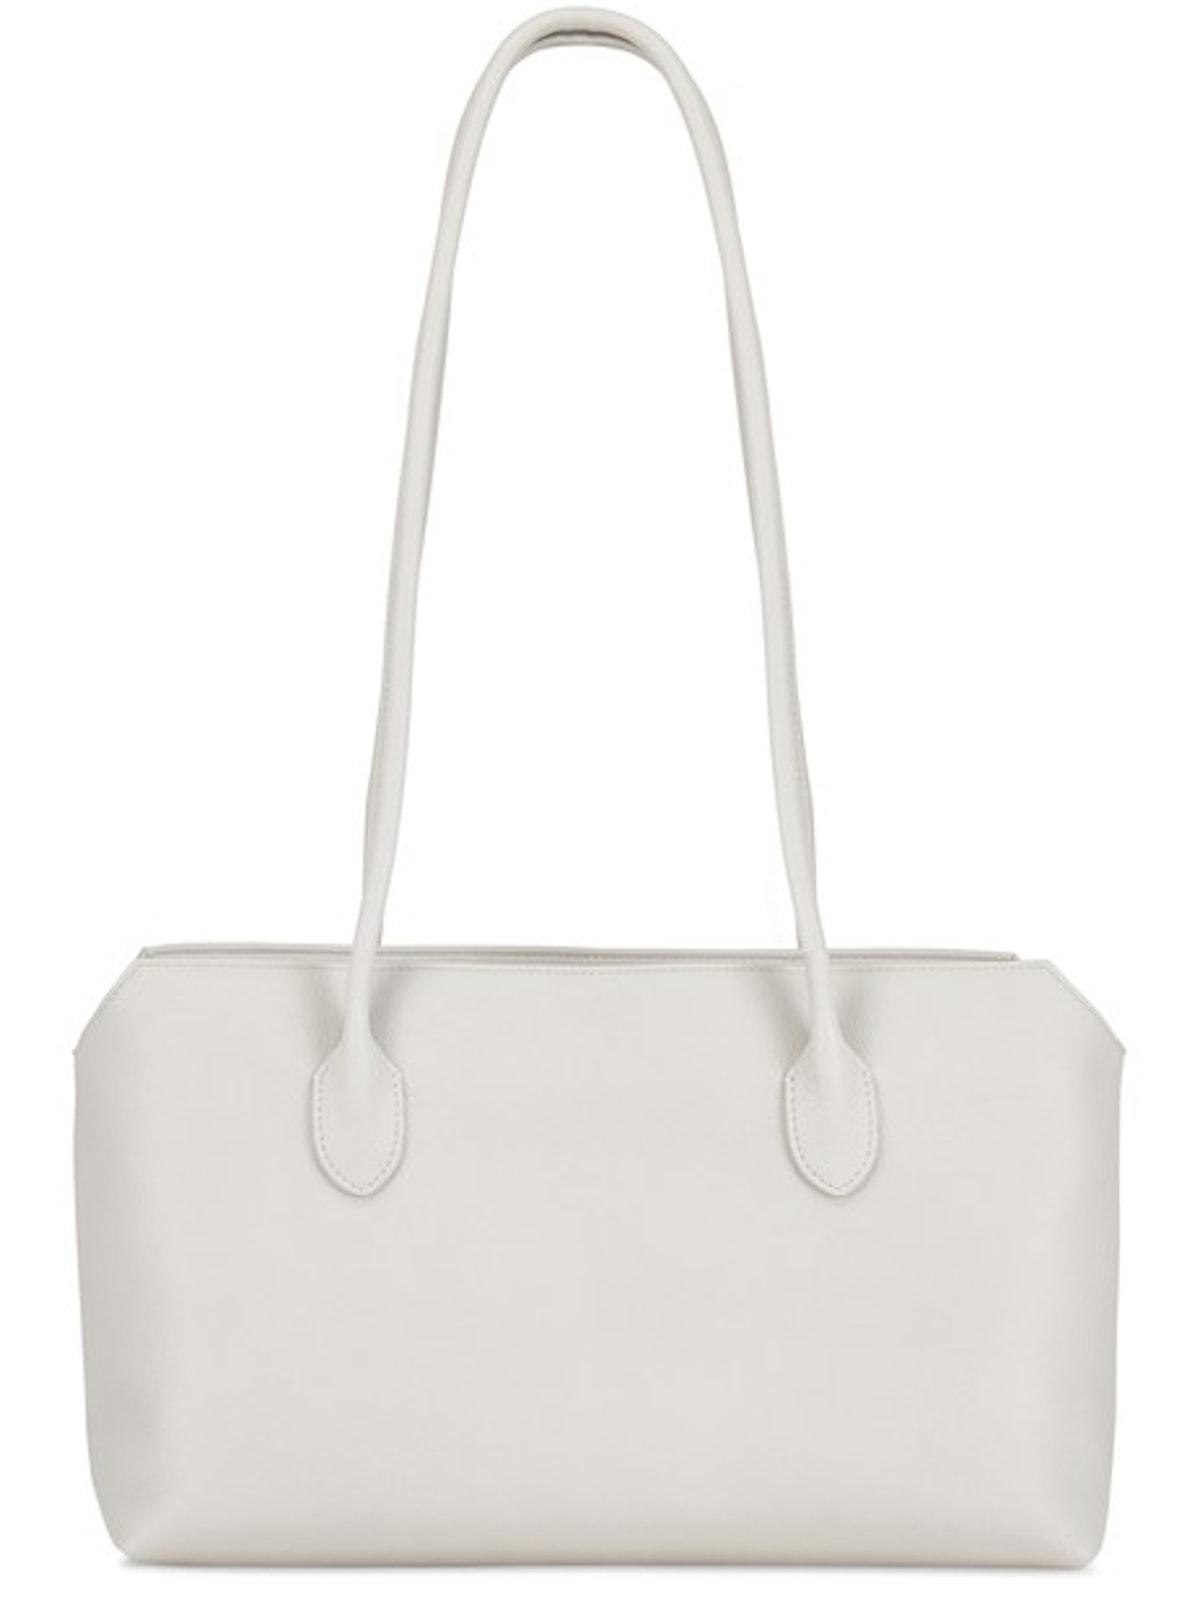 Terrasse Handbag: image 1